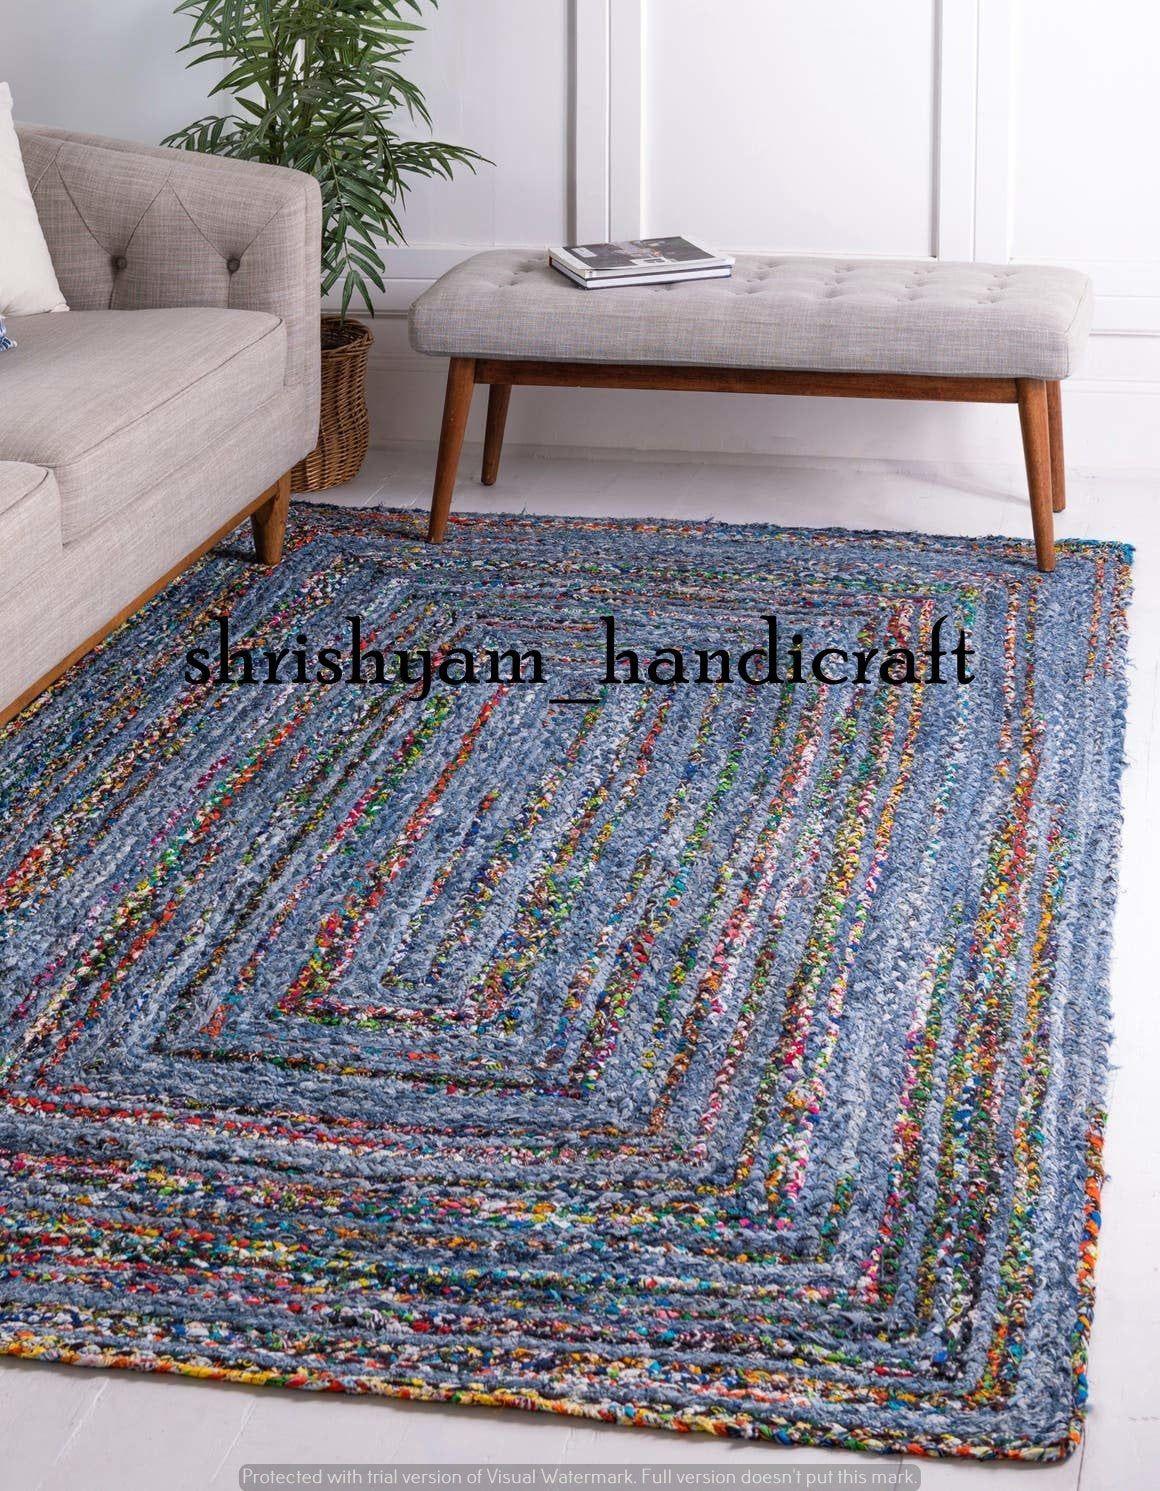 Hand Braided Bohemian Colorful Cotton Chindi Area Rug Multi Colors Home Decor Rugs Cotton Area Rugs 6x9 Feet Rug Rag Area Rug Braided Rugs In 2020 Braided Rugs Cotton Area Rug